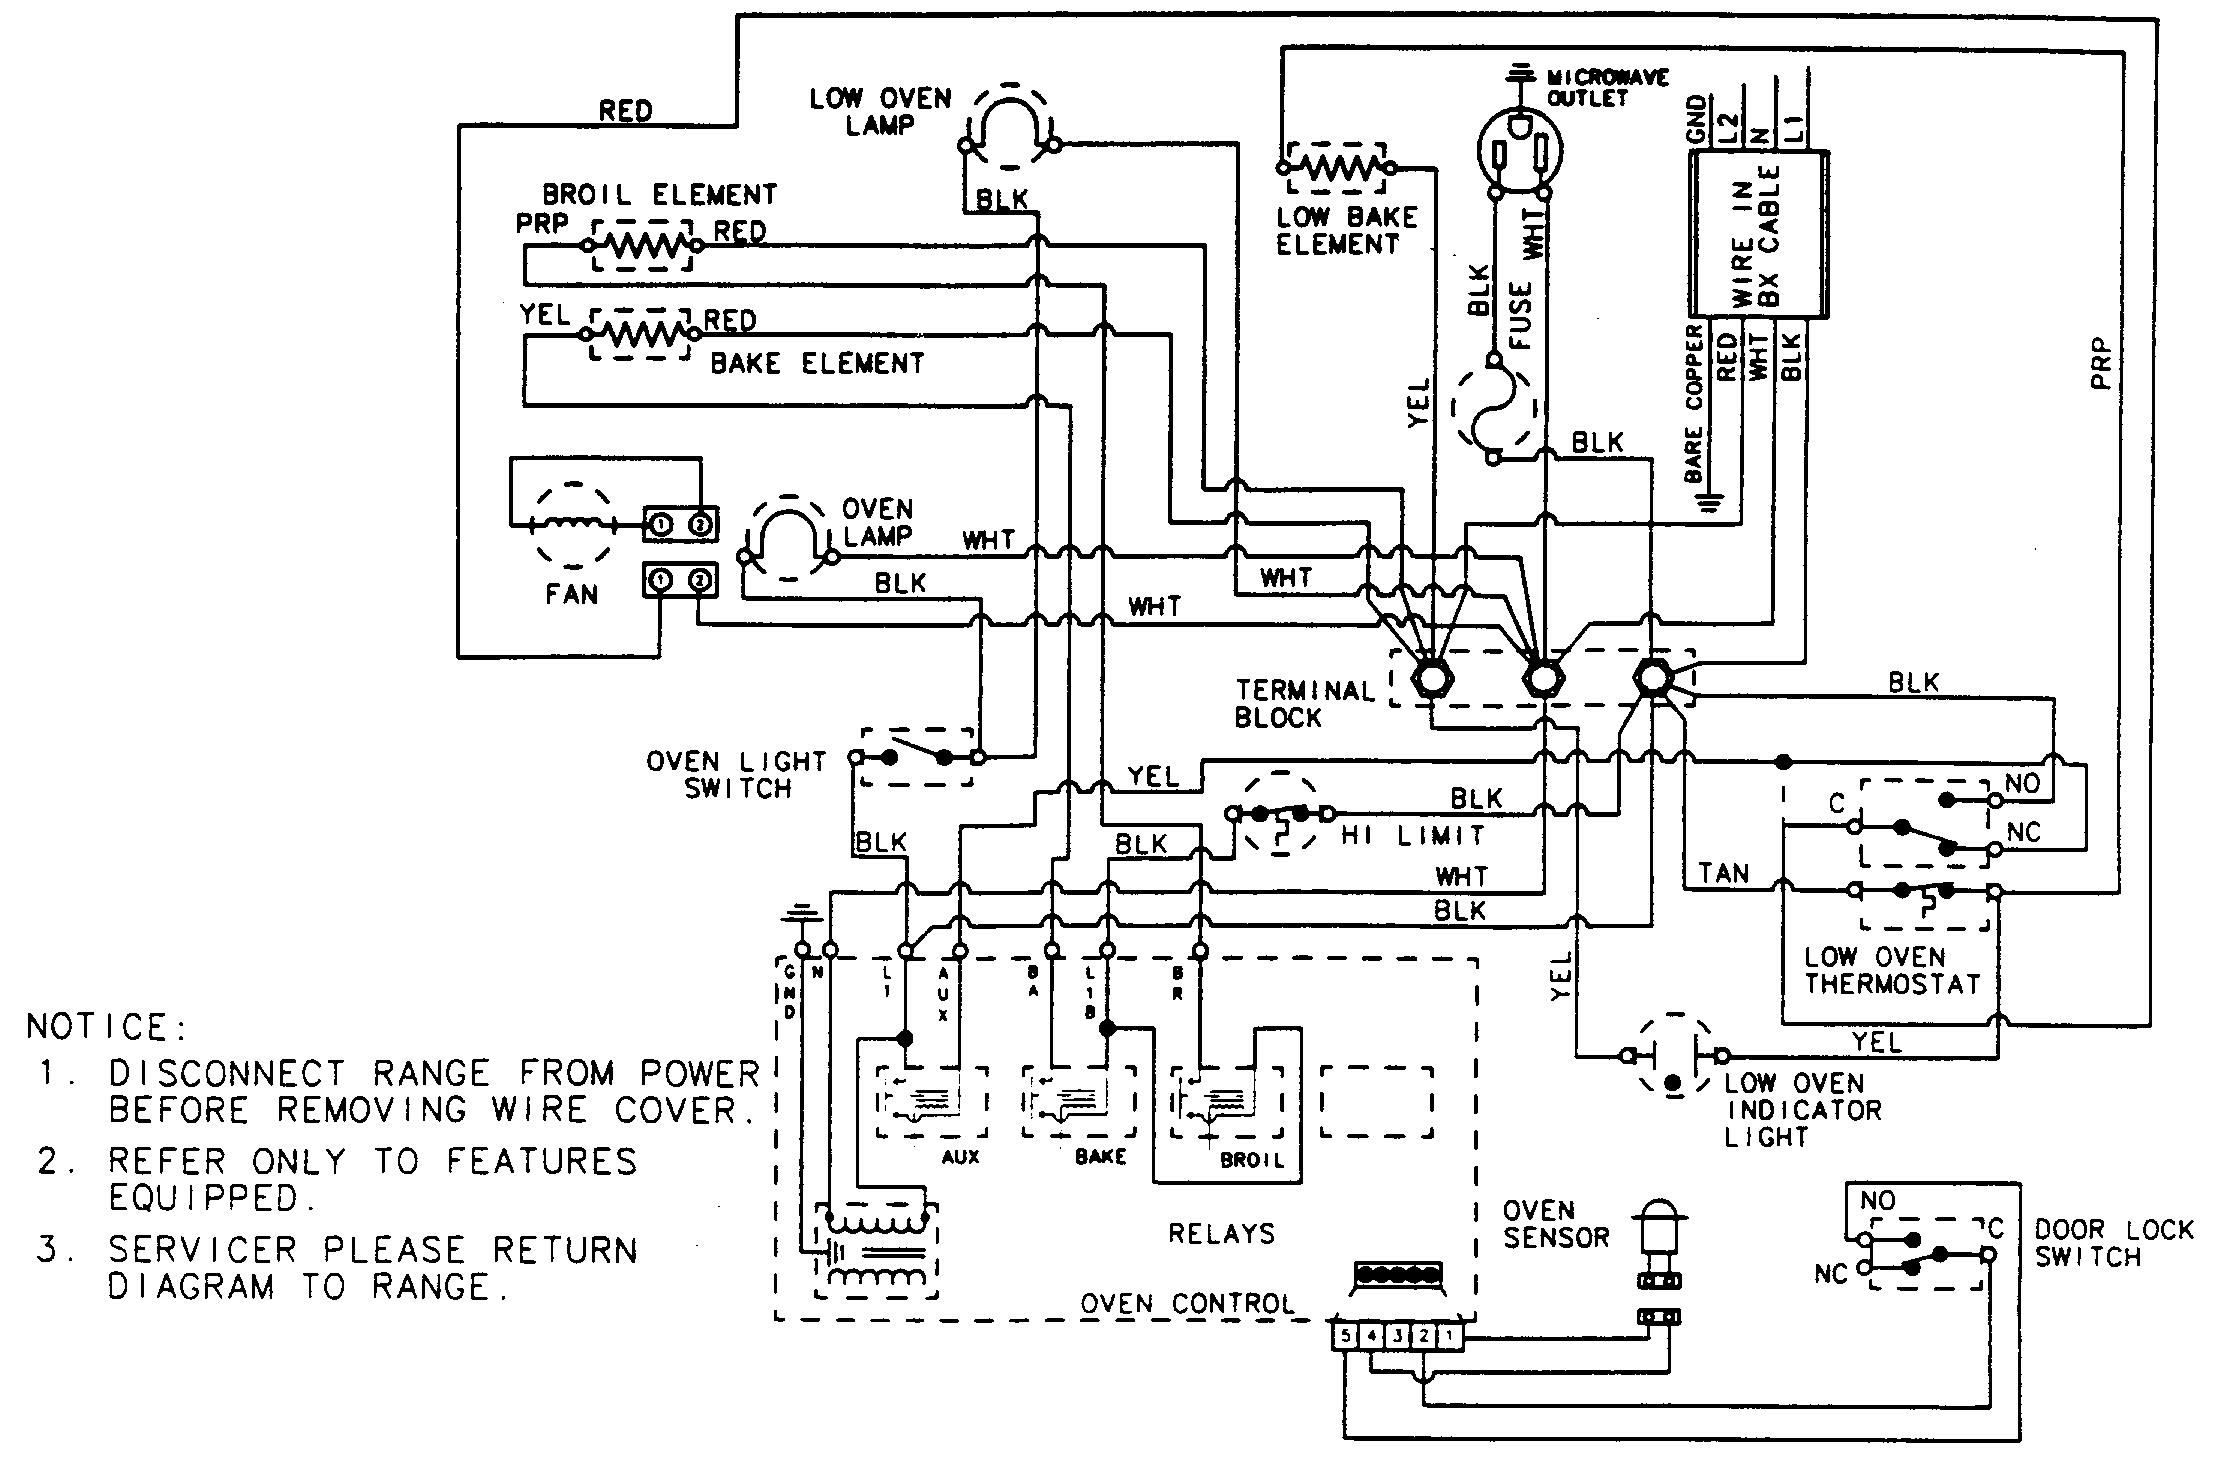 Tom Anderson Strat Wiring Diagram Diagrams David Gilmour Guitar Hotsy Burner Vintage